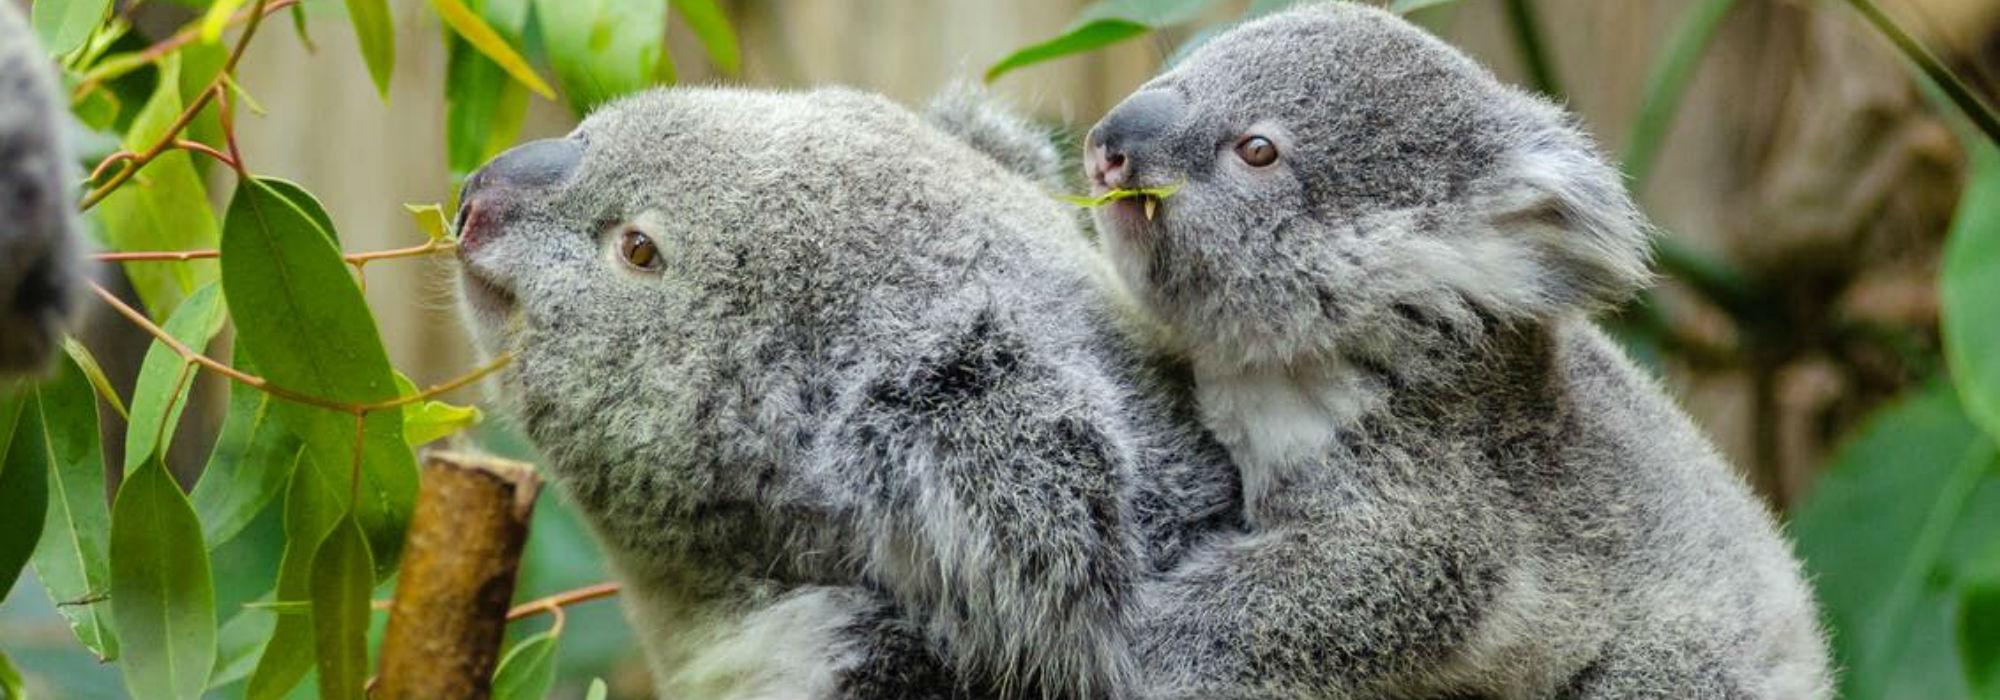 Save Sydney's Koalas